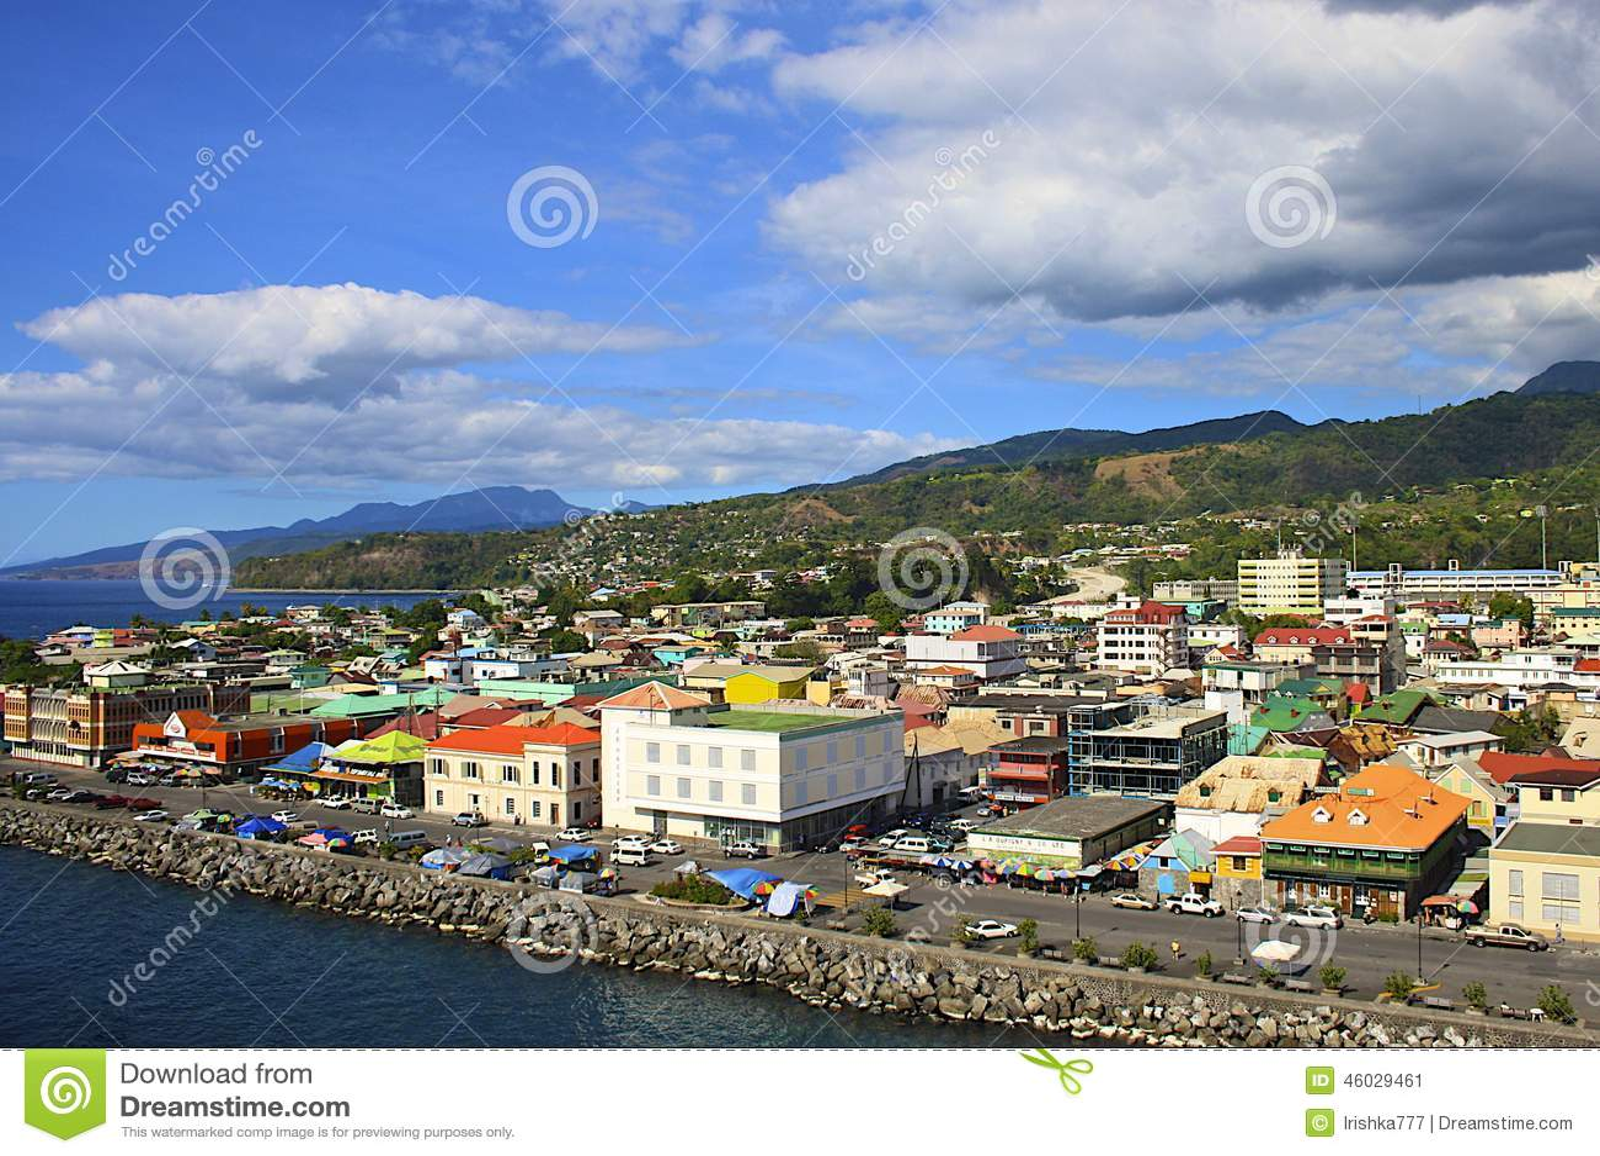 Panorama of Roseau, Dominica, Caribbean